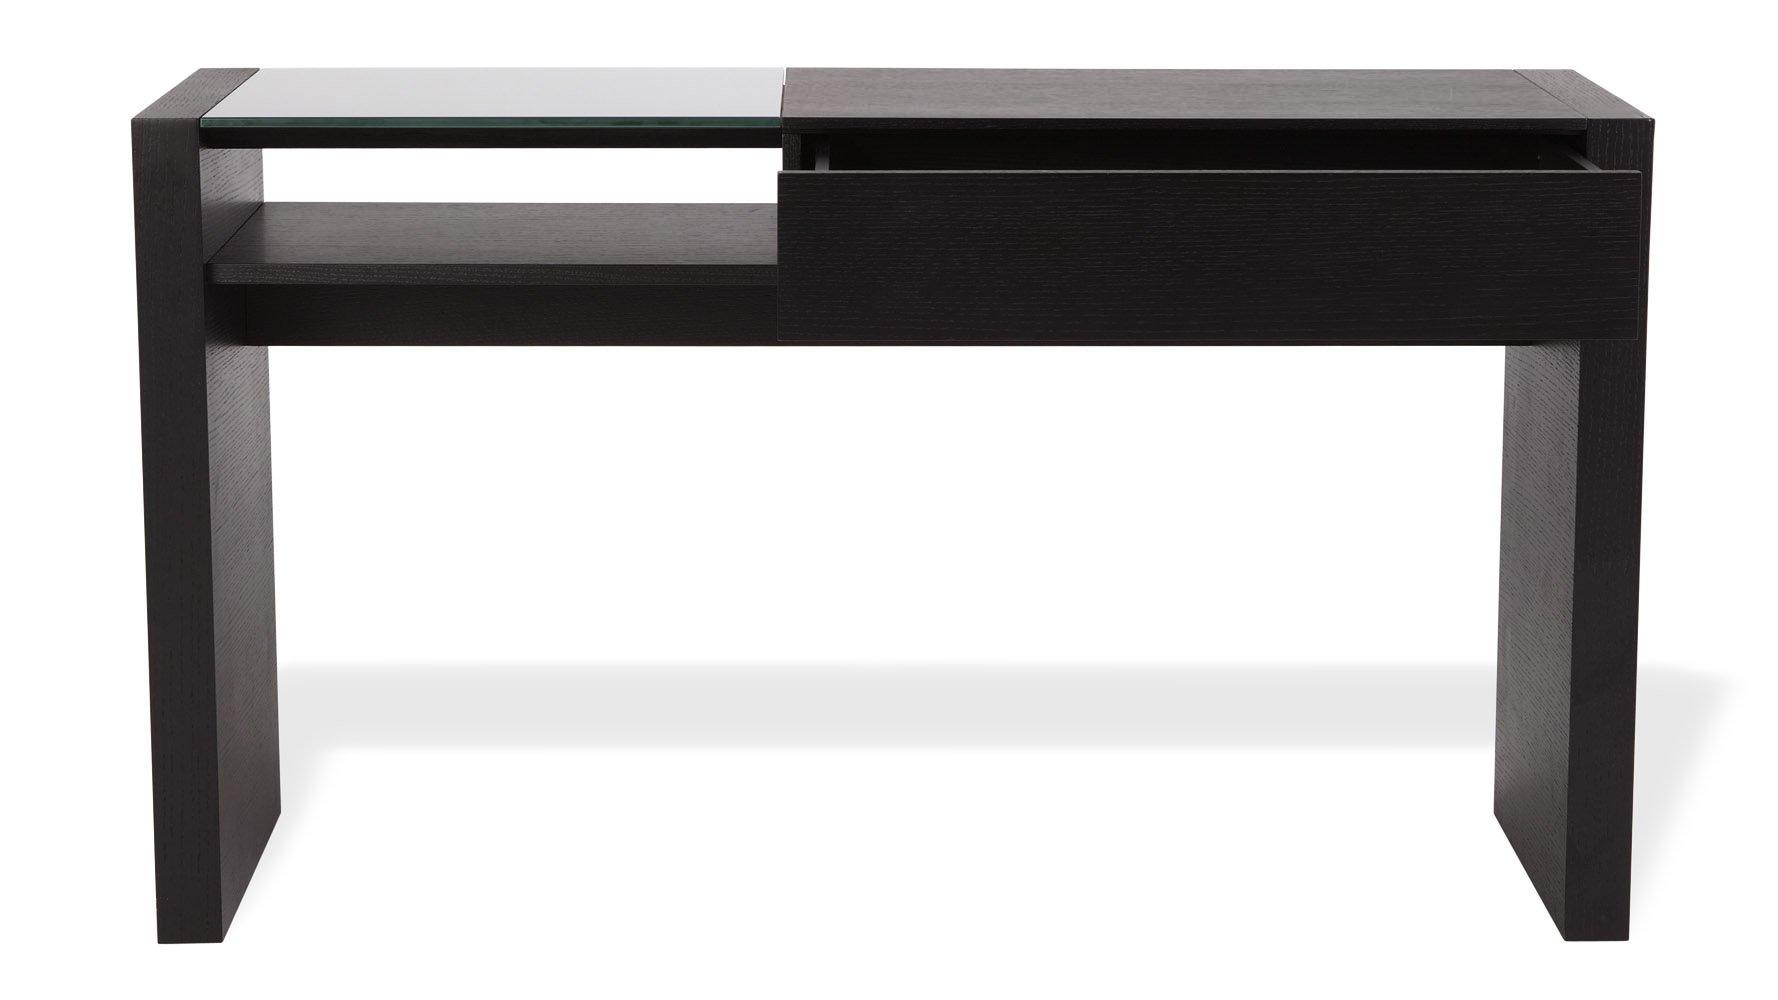 Beautiful Etta Black Oak Modern Console Table With Drawer And Glass Shelf | Zuri  Furniture